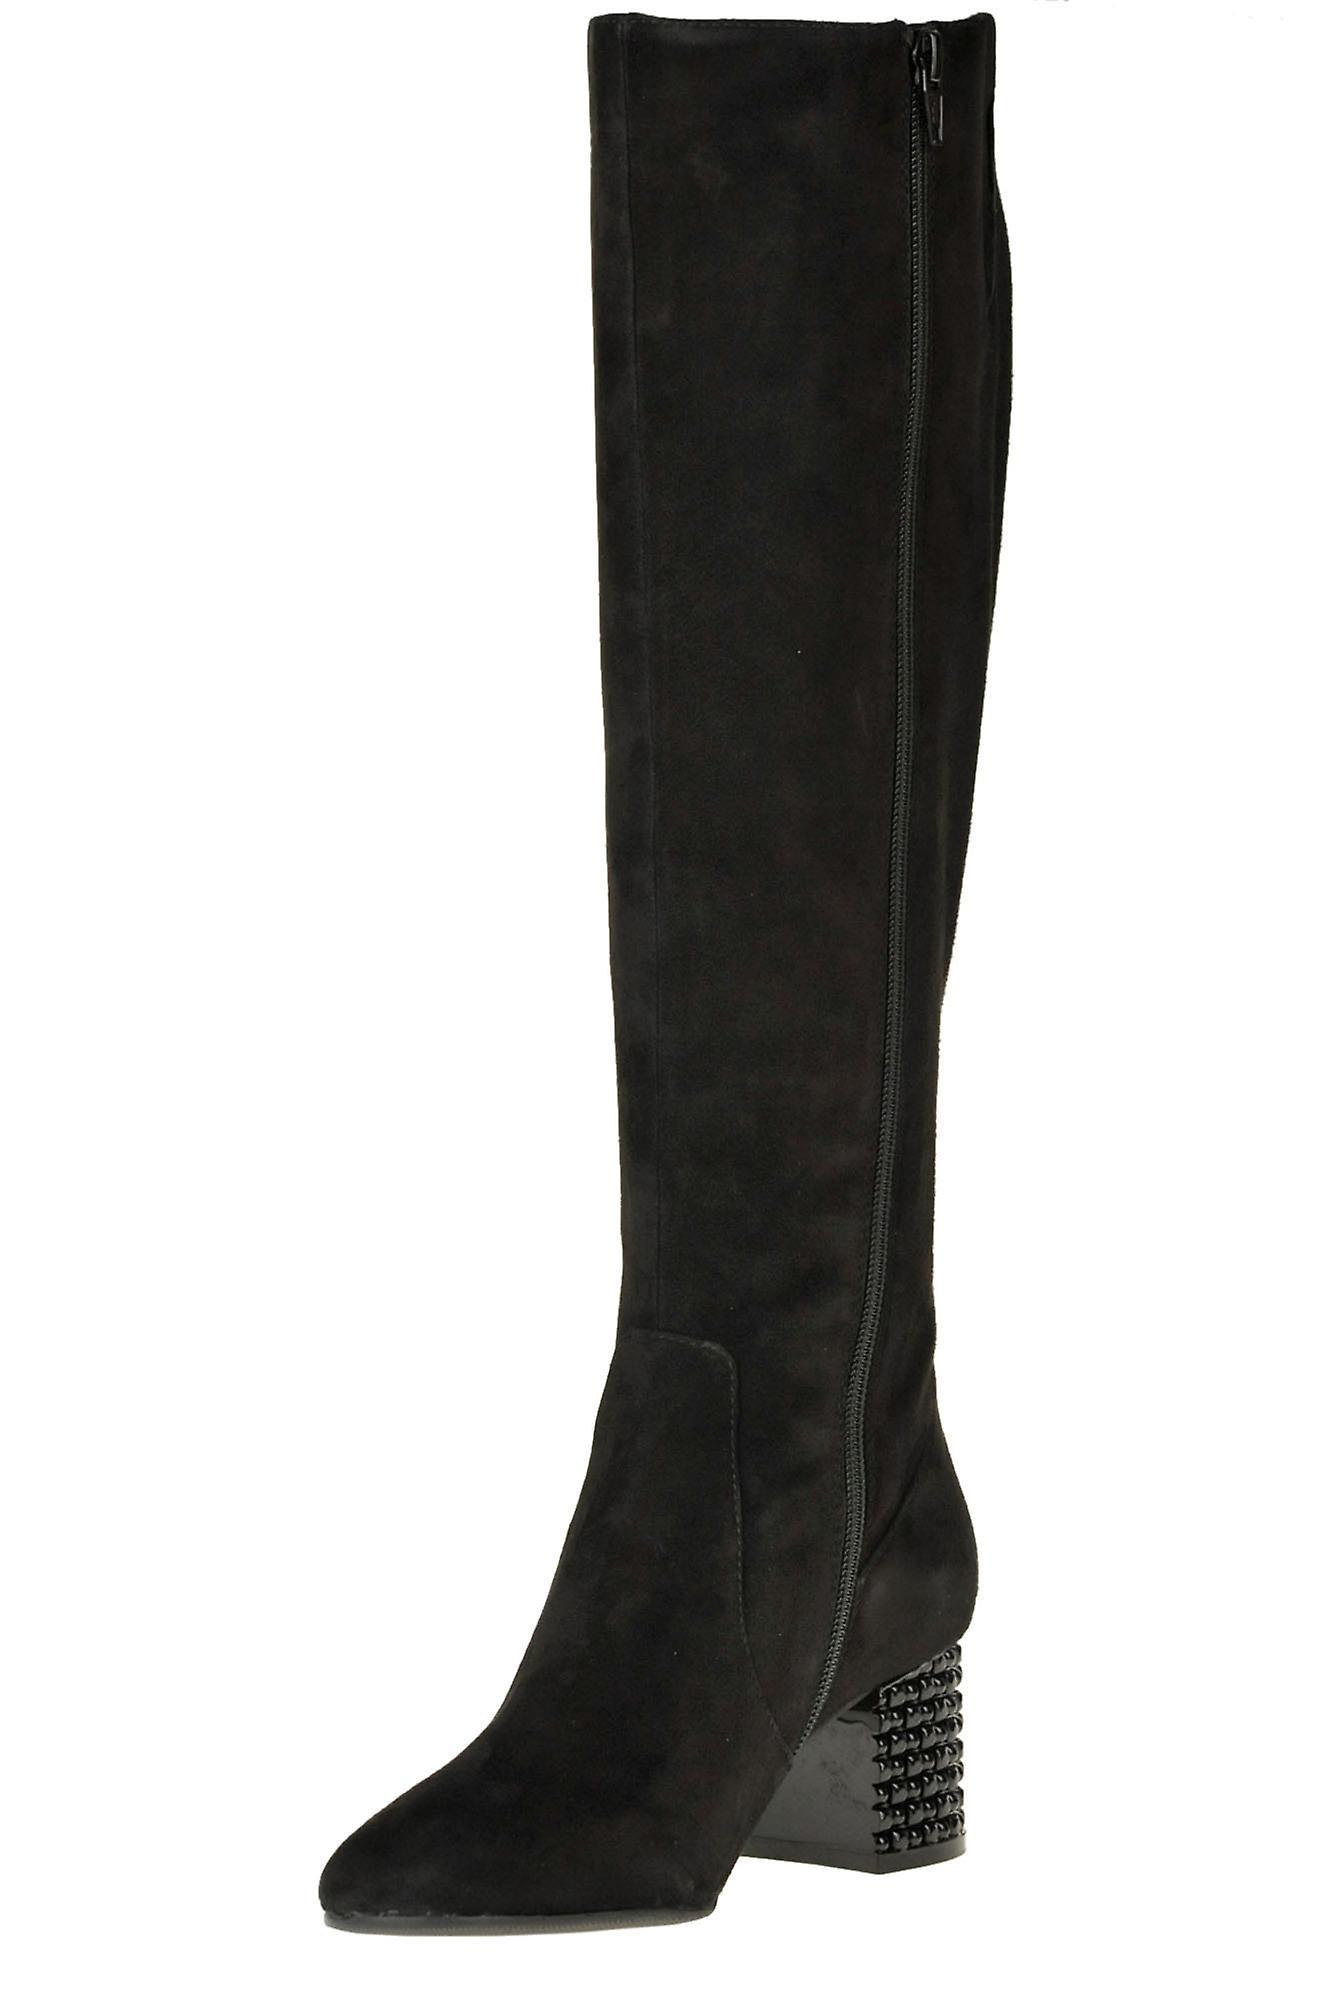 Adele Dezotti Ezgl540002 Women's Black Suede Boots